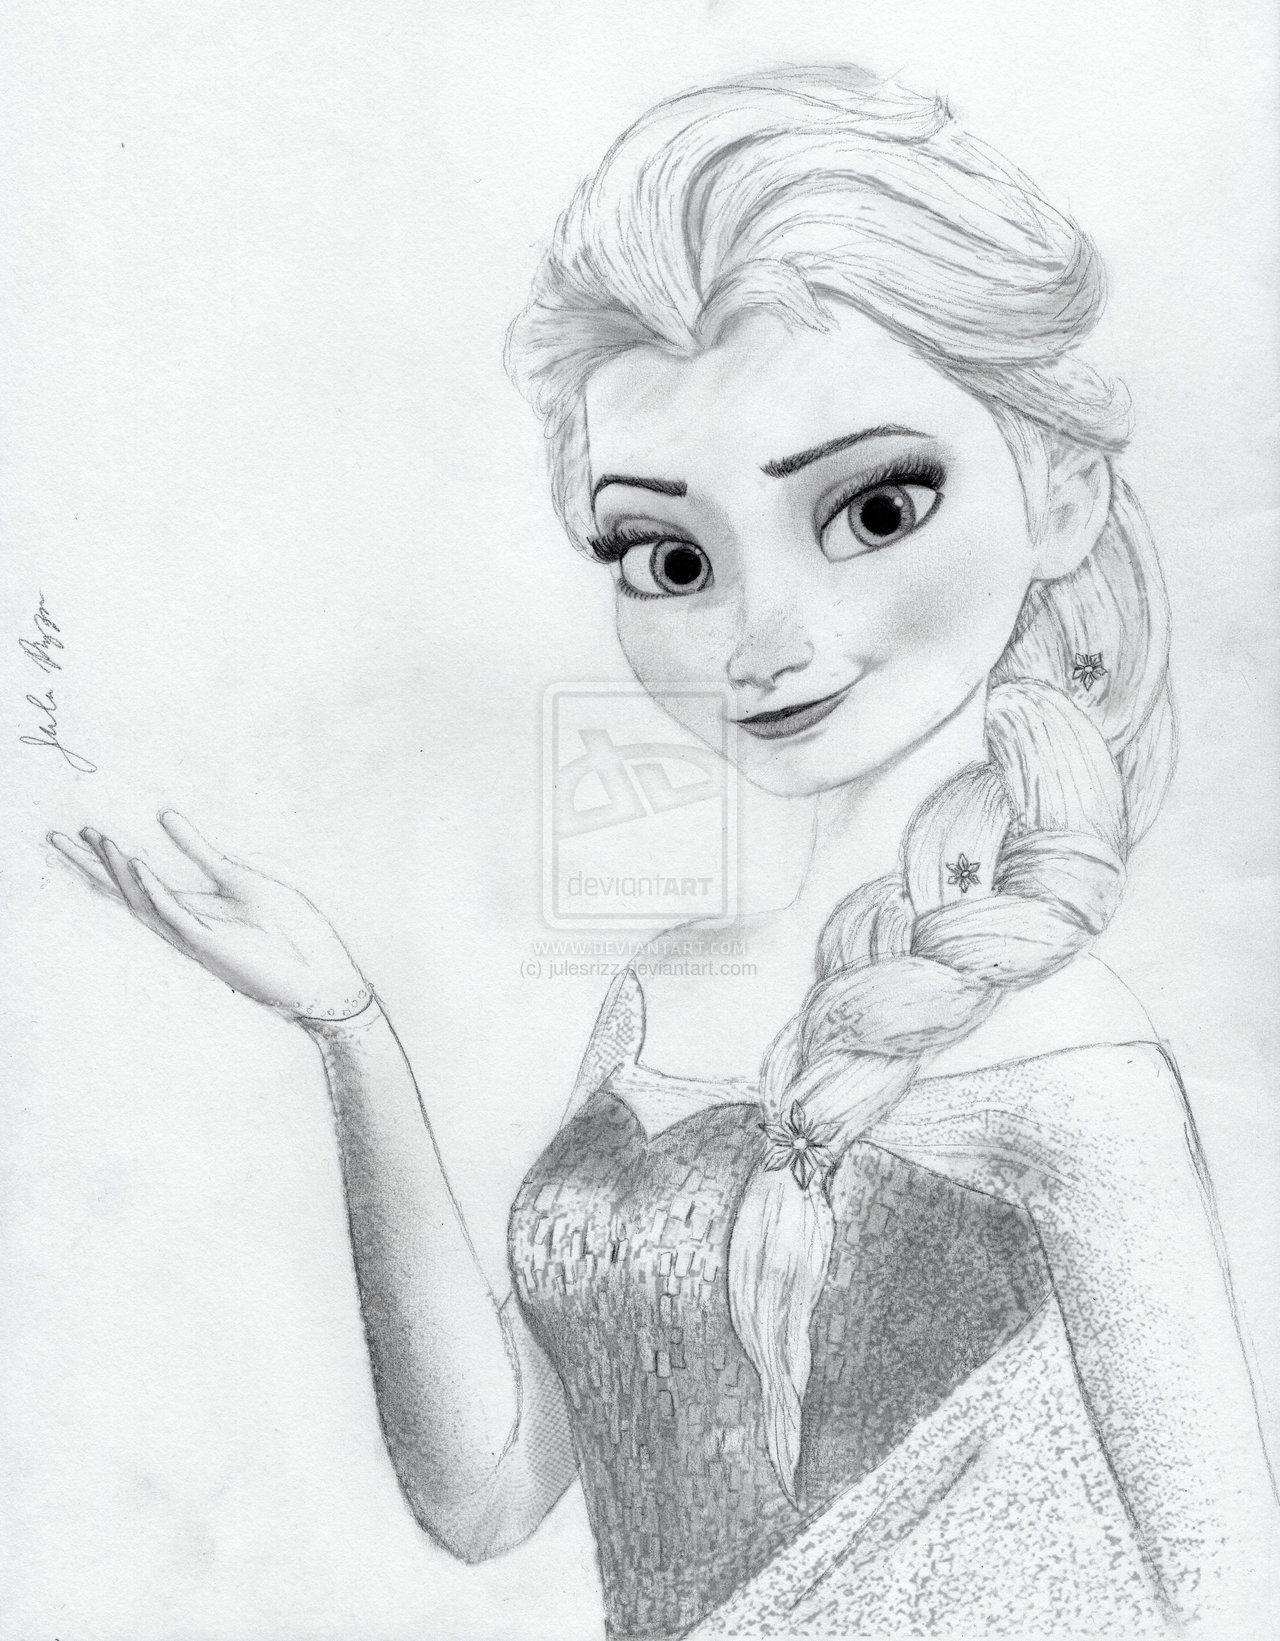 Elsa From Disneys Frozen By Julesrizzdeviantart On